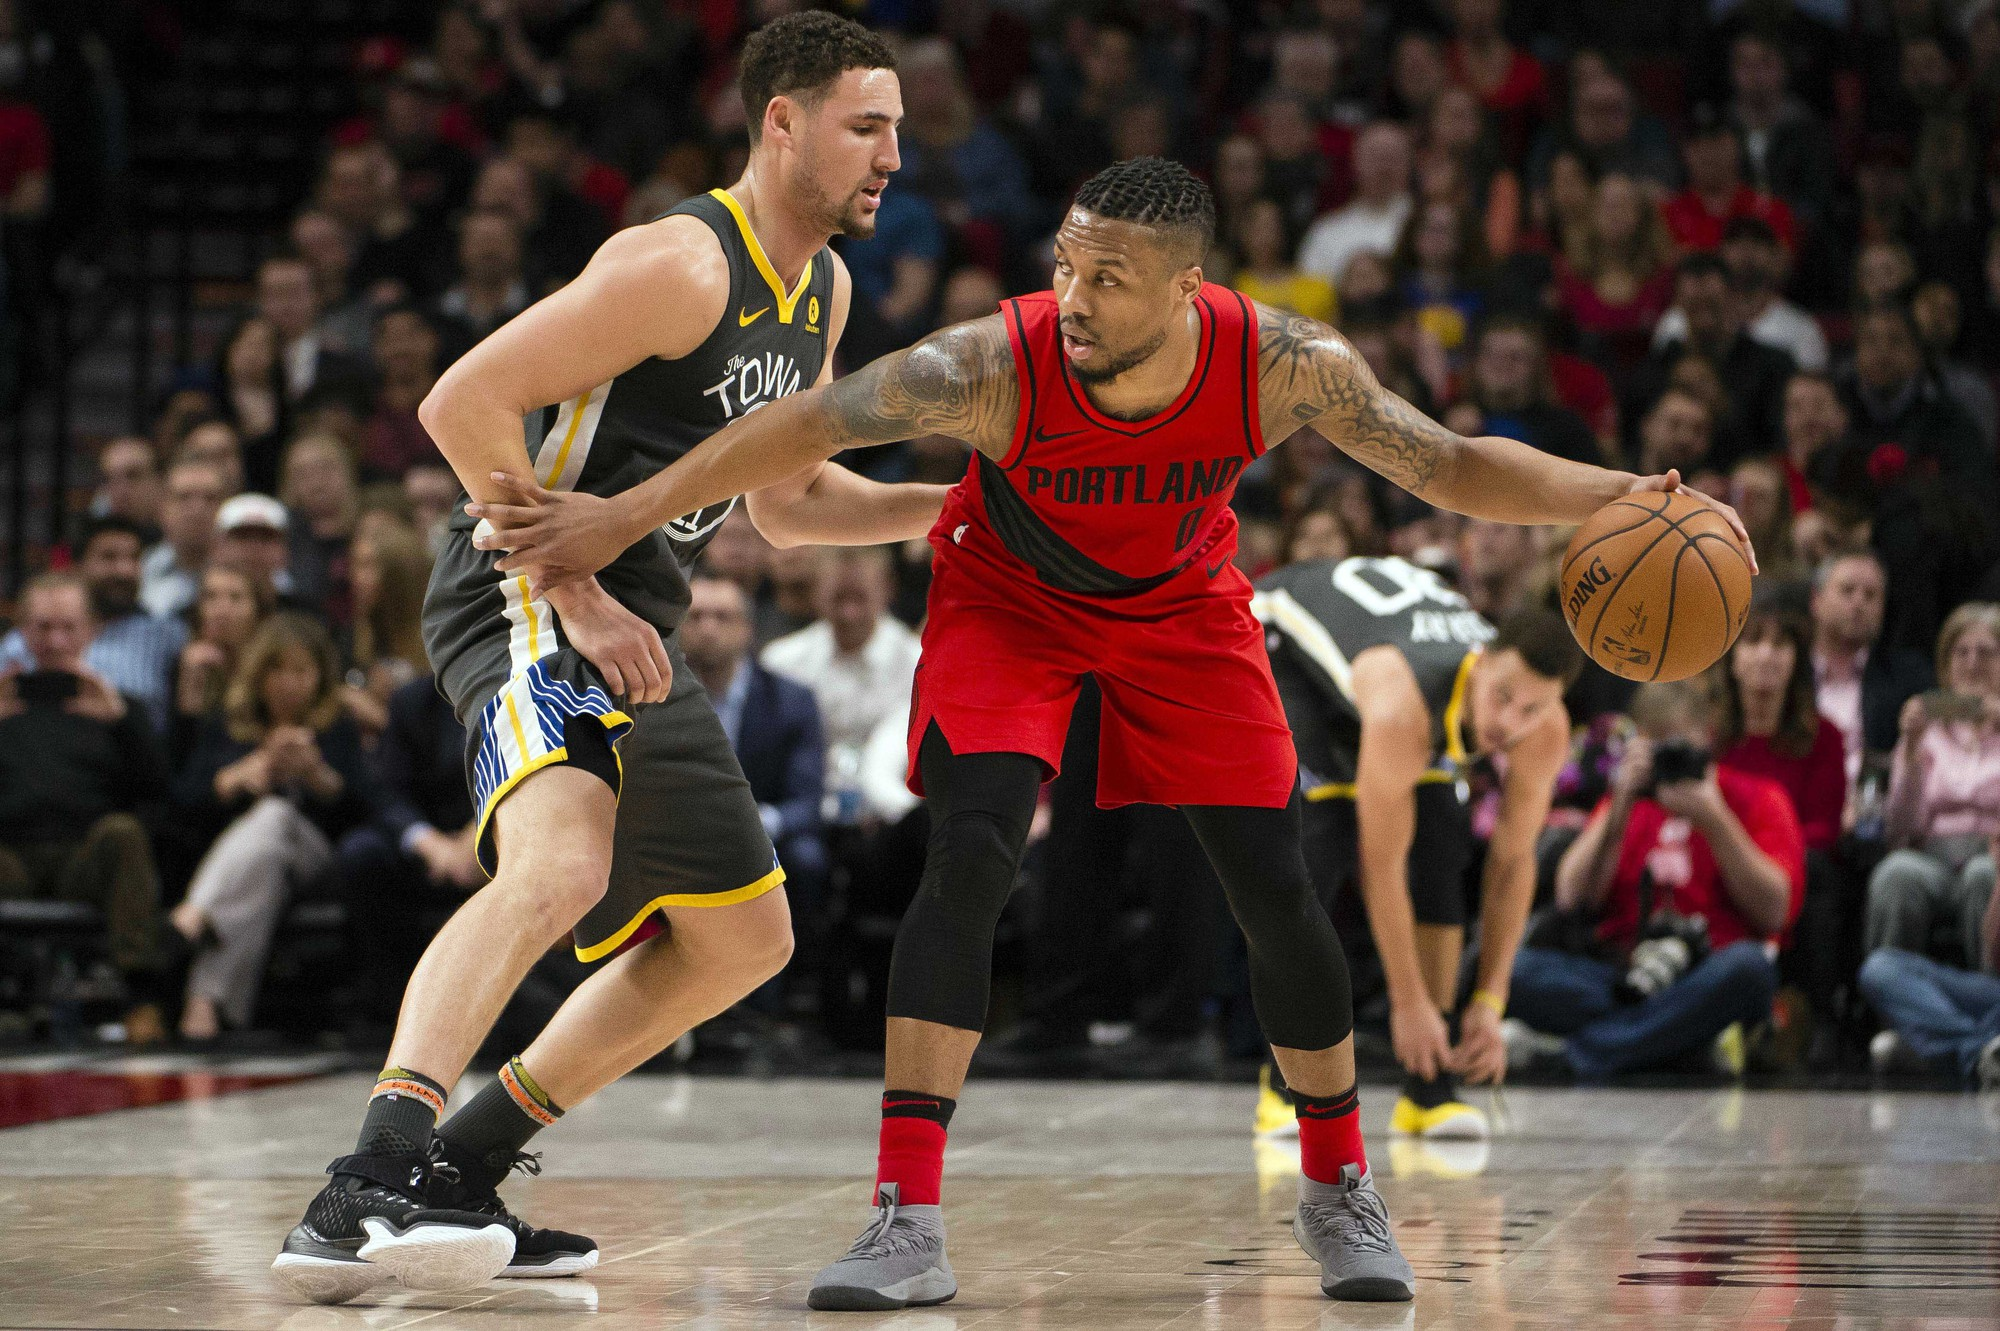 Dự đoán NBA: Golden State Warriors vs Portland Trail Blazers - Ảnh 1.